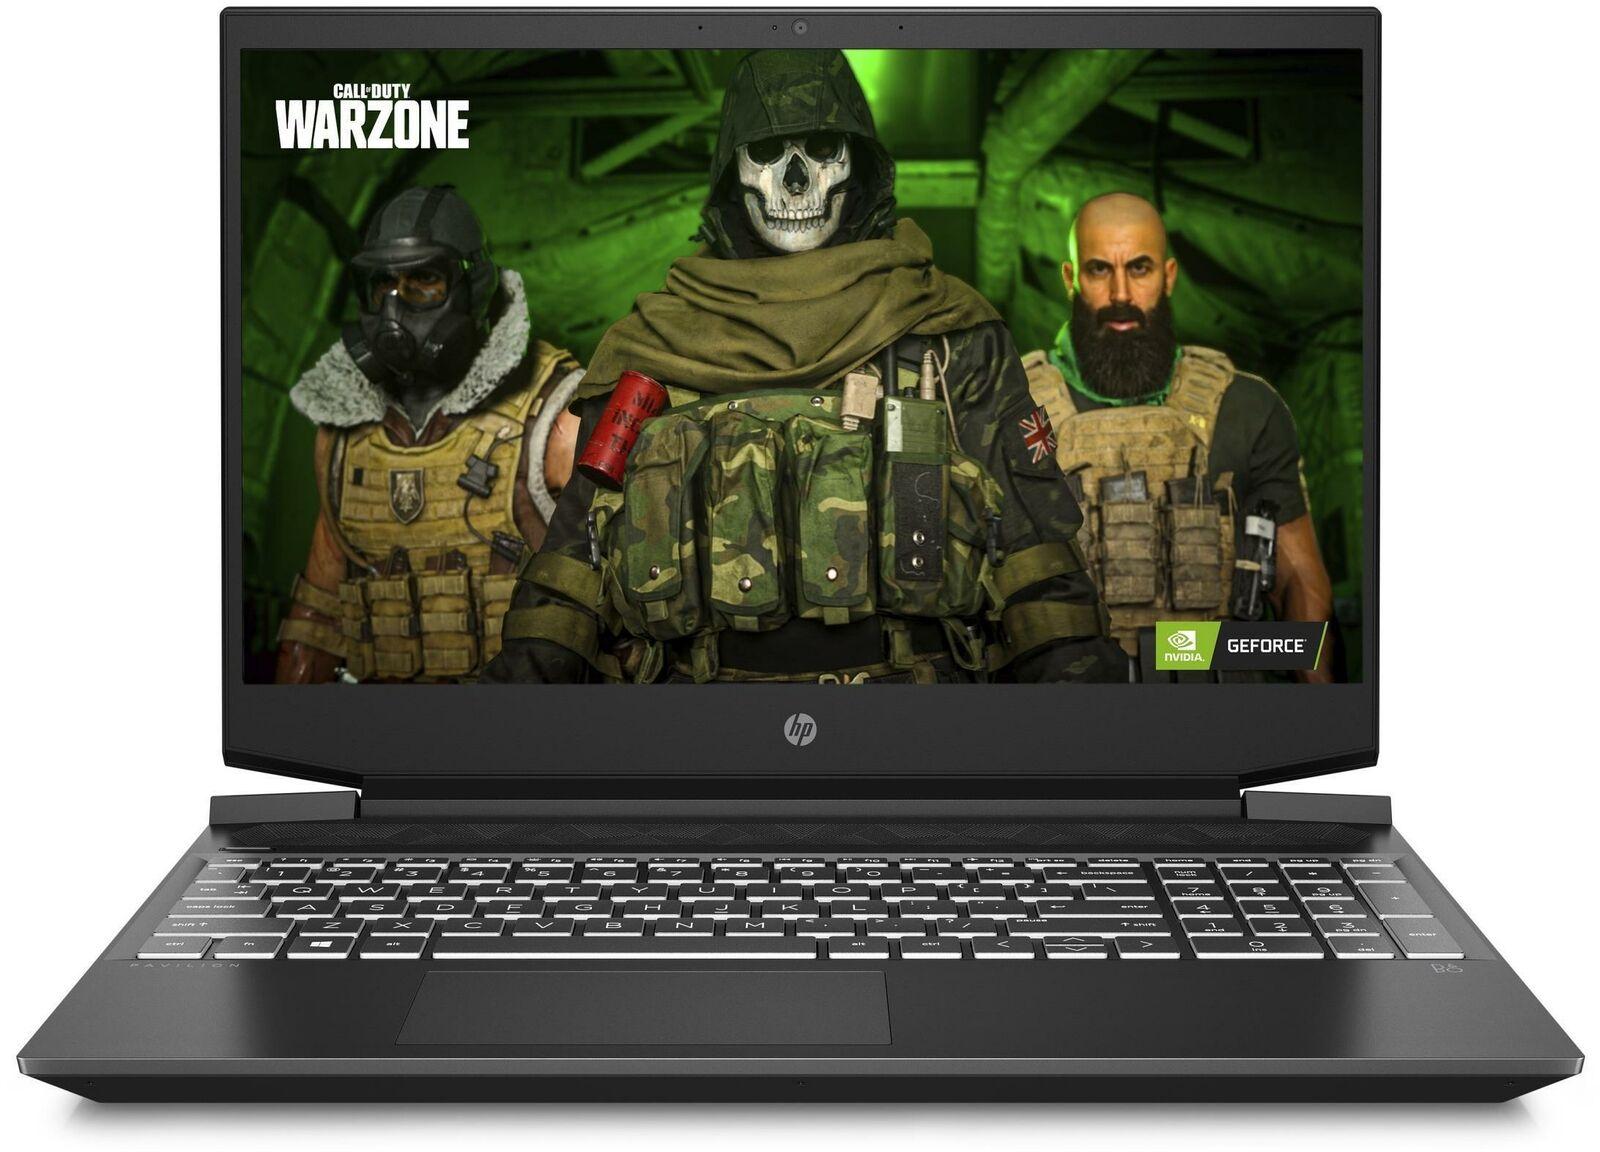 "HP Pavilion 15.6"" FHD IPS Ryzen 5 4600H GTX 1650Ti 8GB RAM 256GB SSD Gaming Laptop, £579.97 with code at Box_deals/ebay"